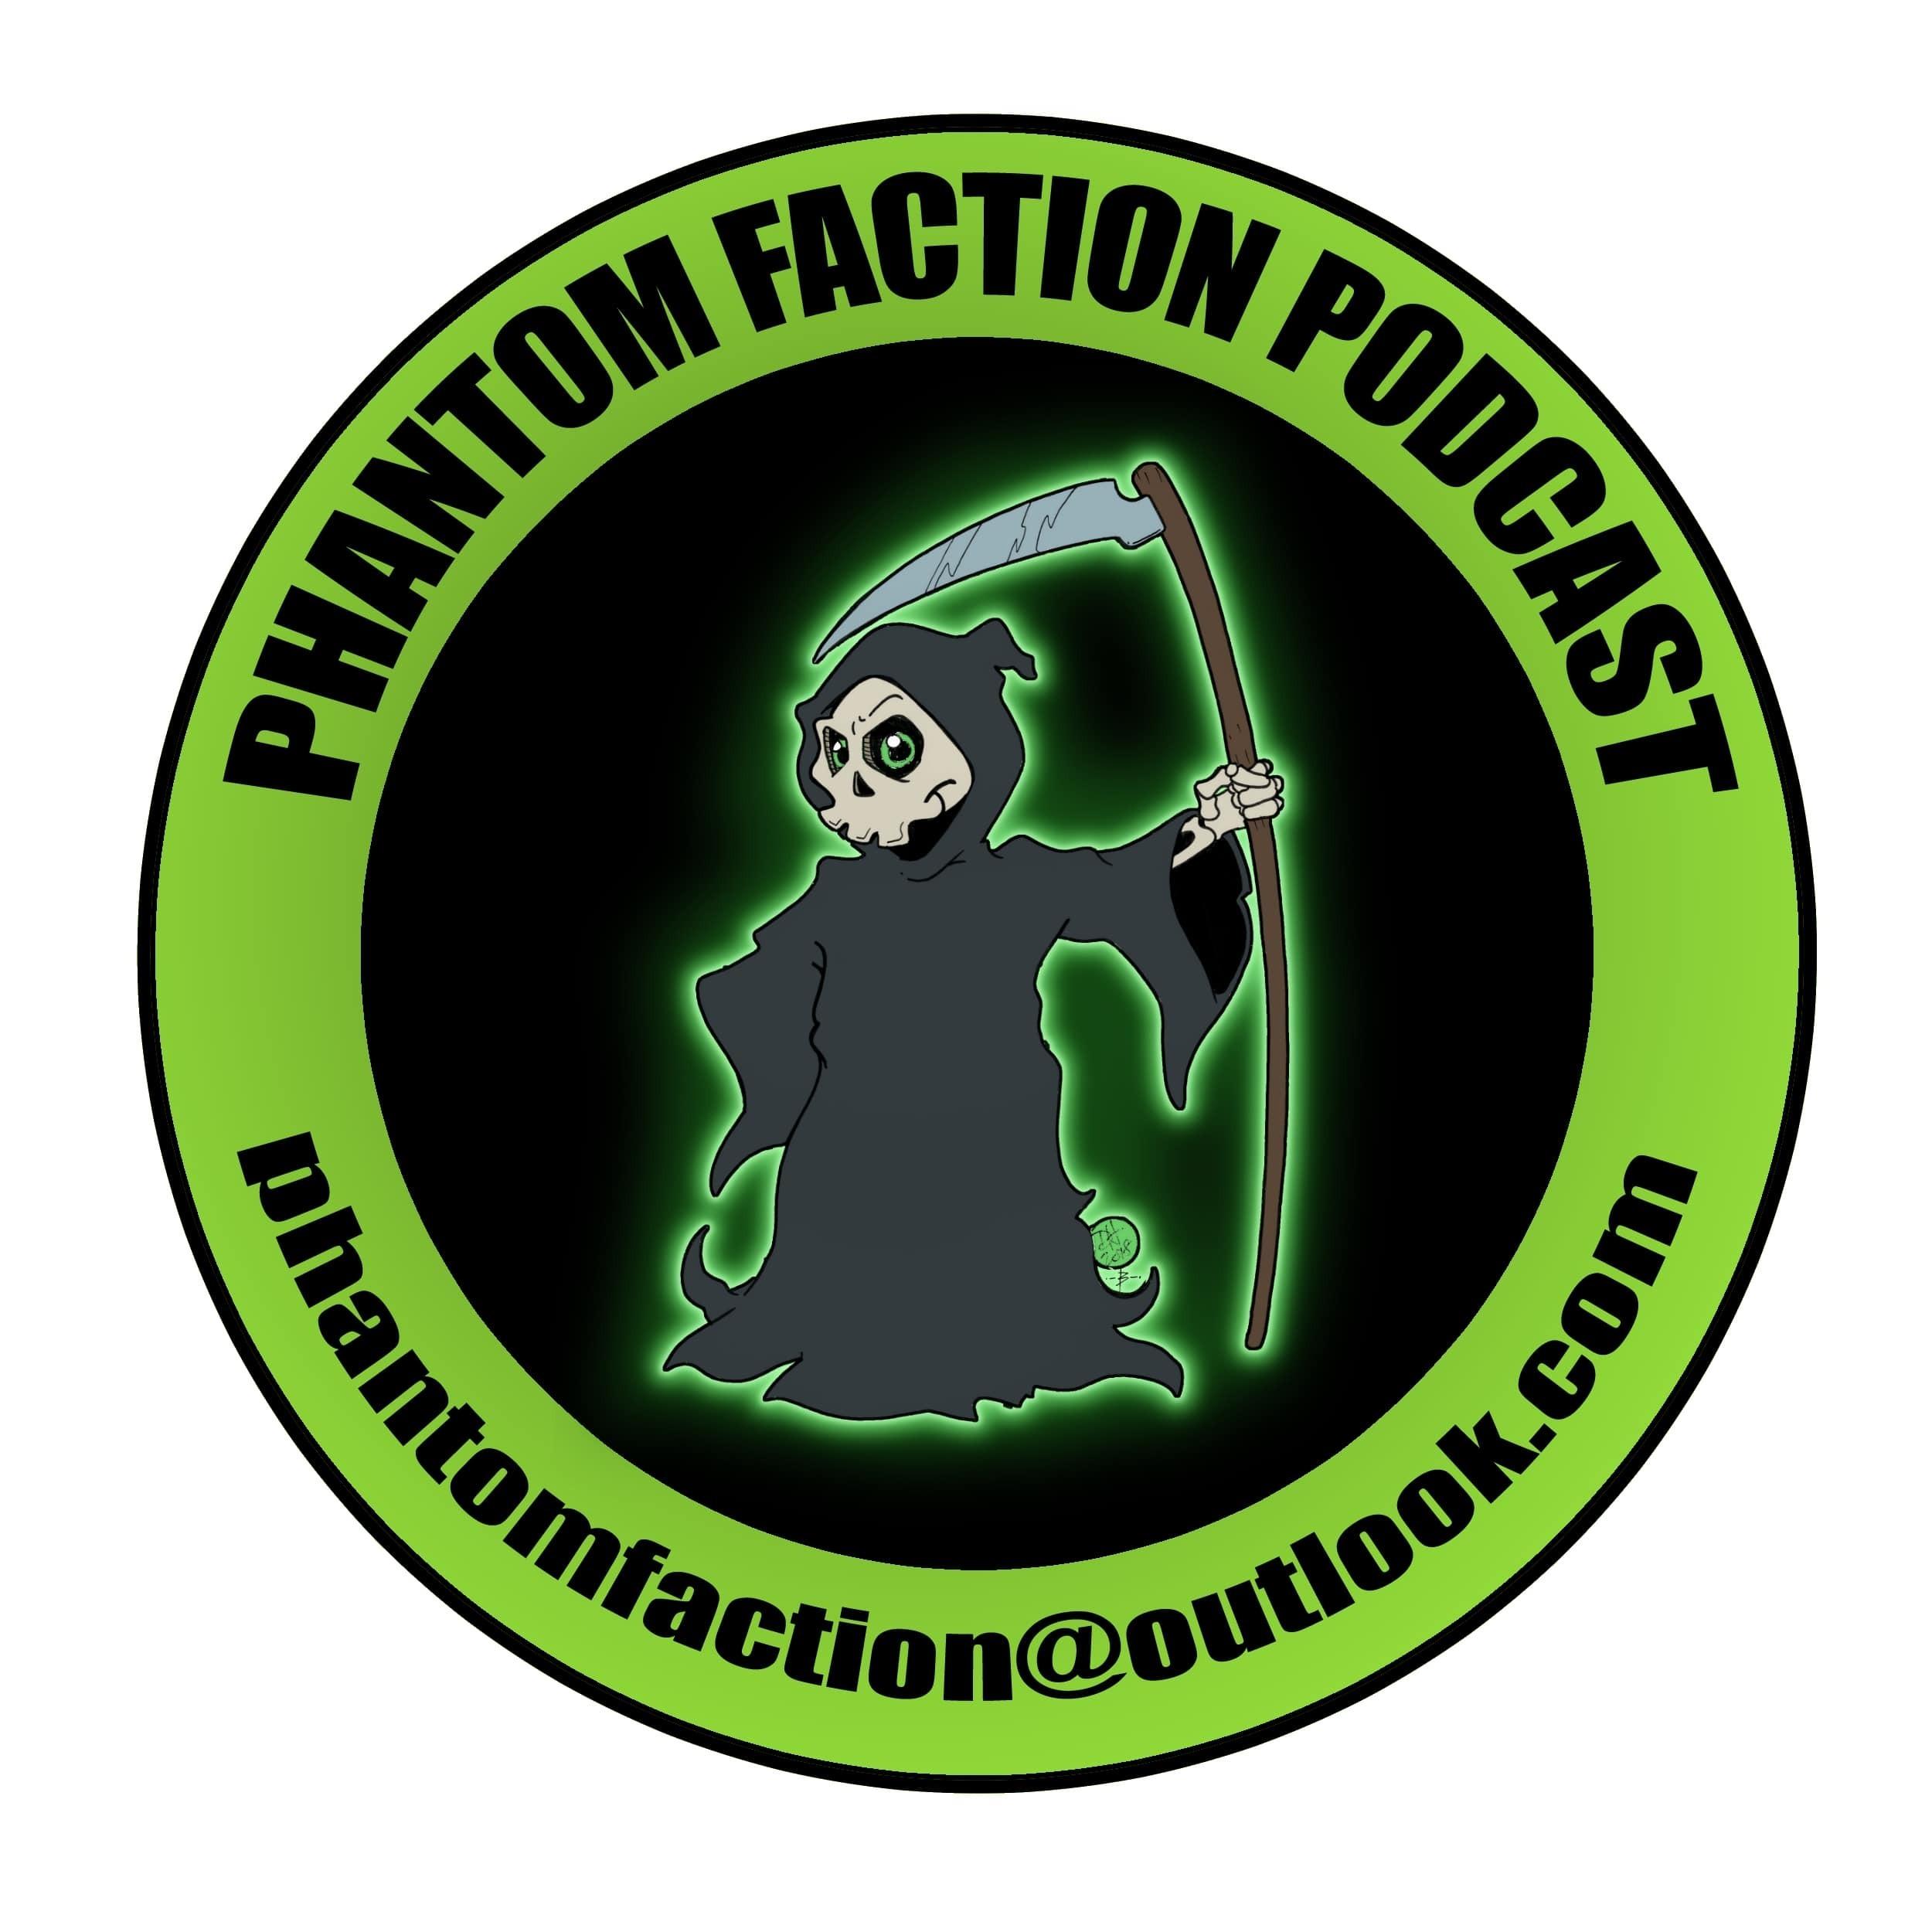 pfp-episode 35-exorcism and religion